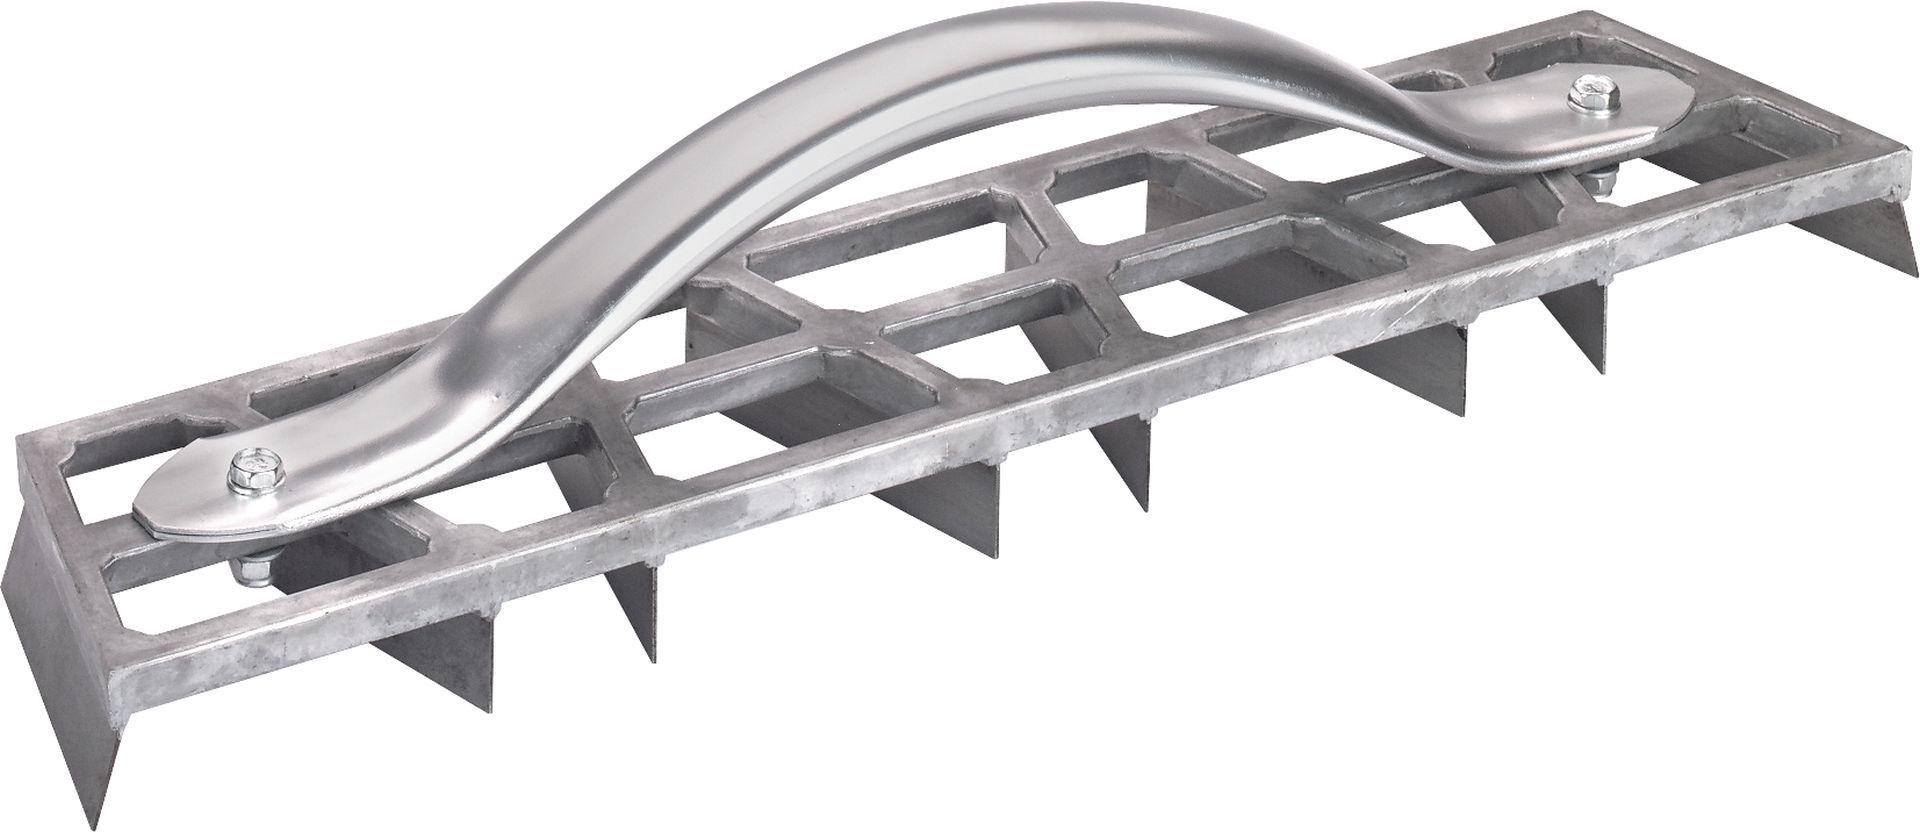 TRIUSO Aluminium-Rabott mit Griff, 8 Stahlklingen, 90 x 450 mm